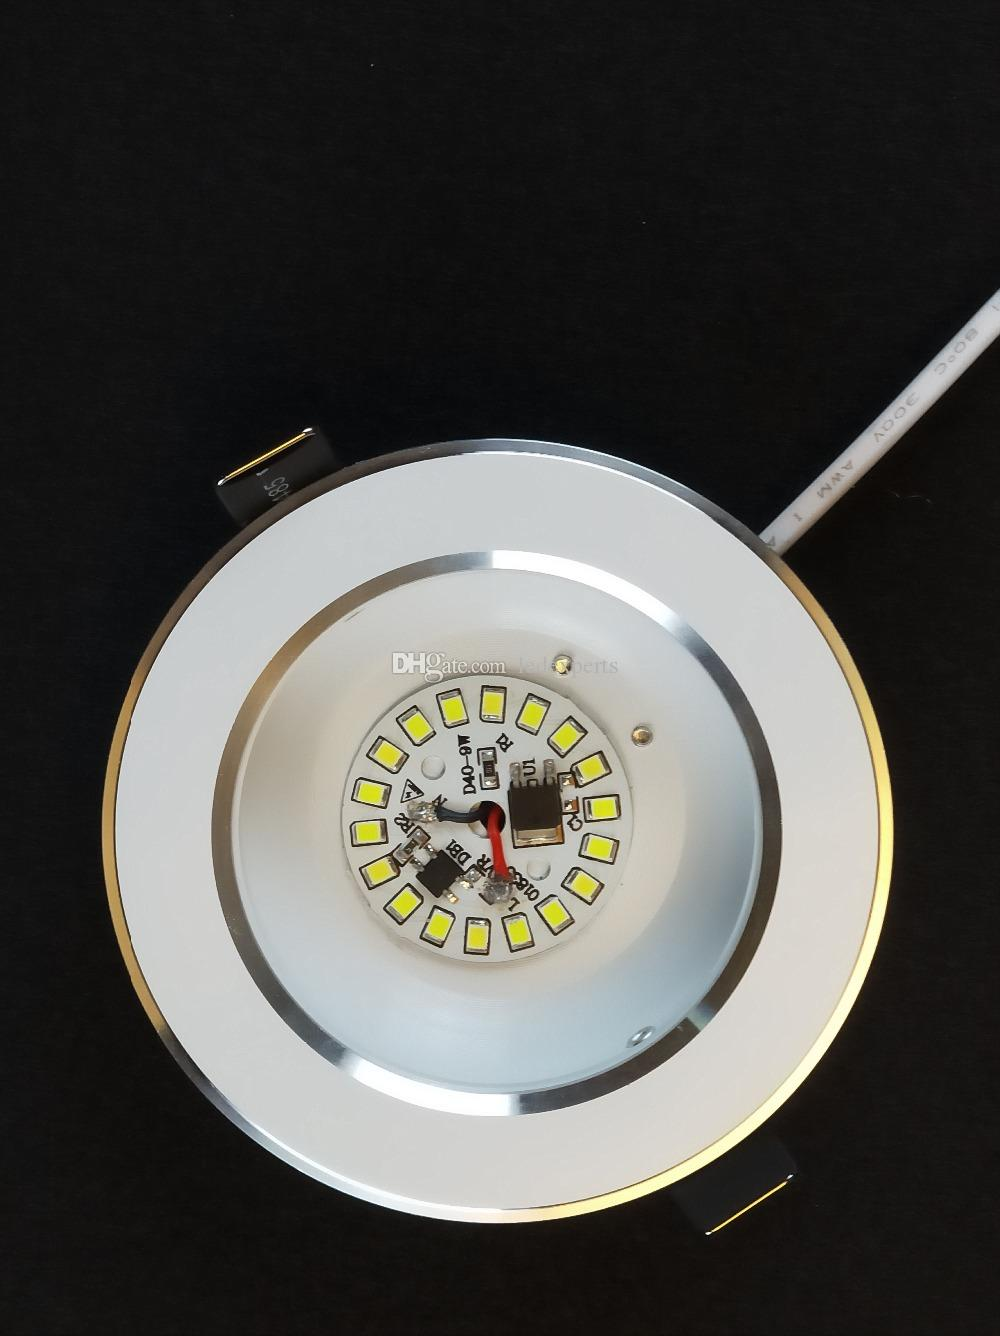 Led Downlights Spot Led Einbau Smd12w Watt Punktlicht Hause ...